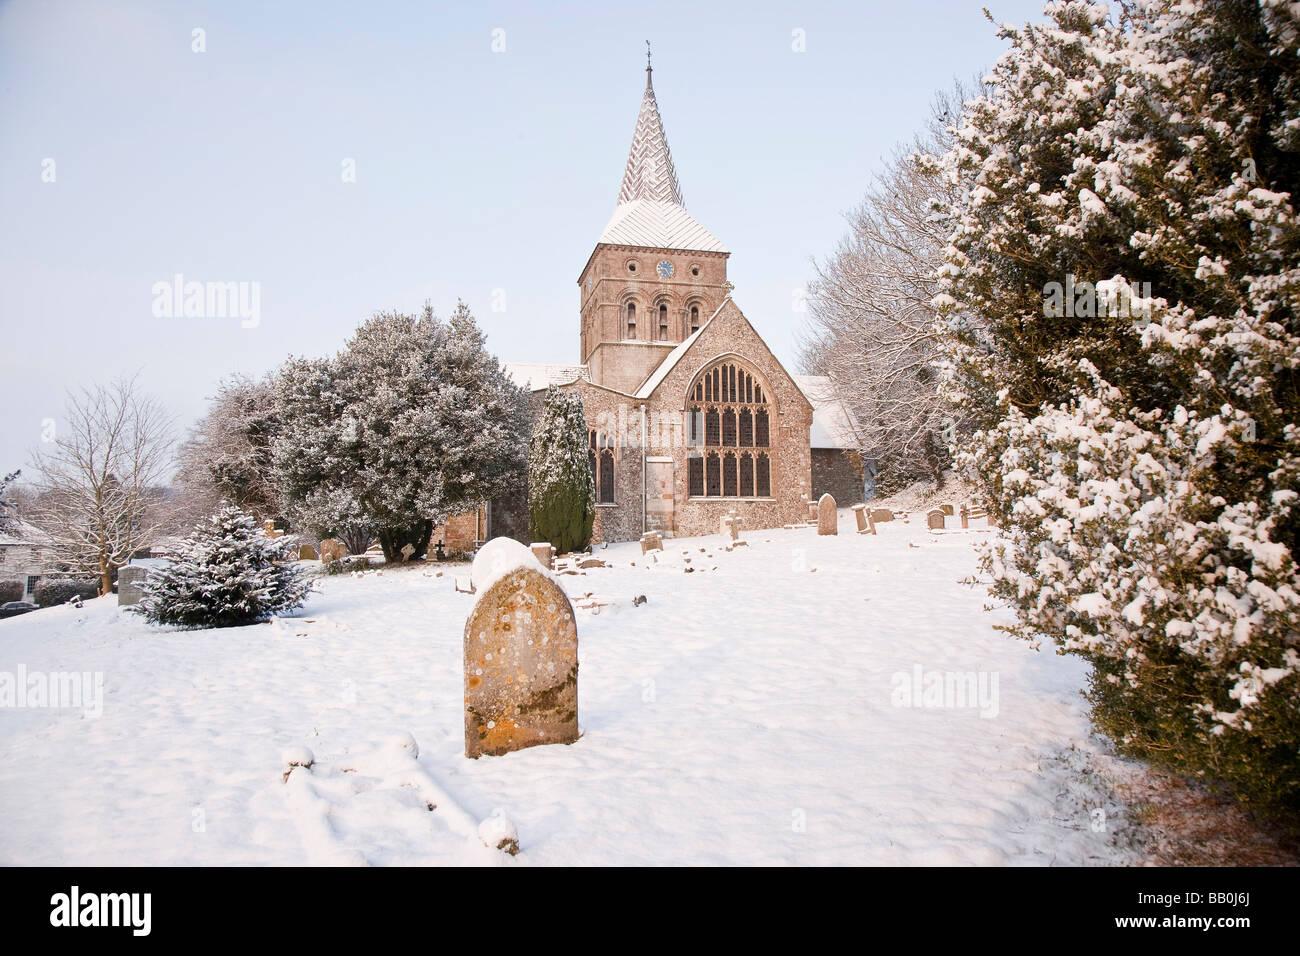 All Saints Church, East Meon, Hampshire - Stock Image